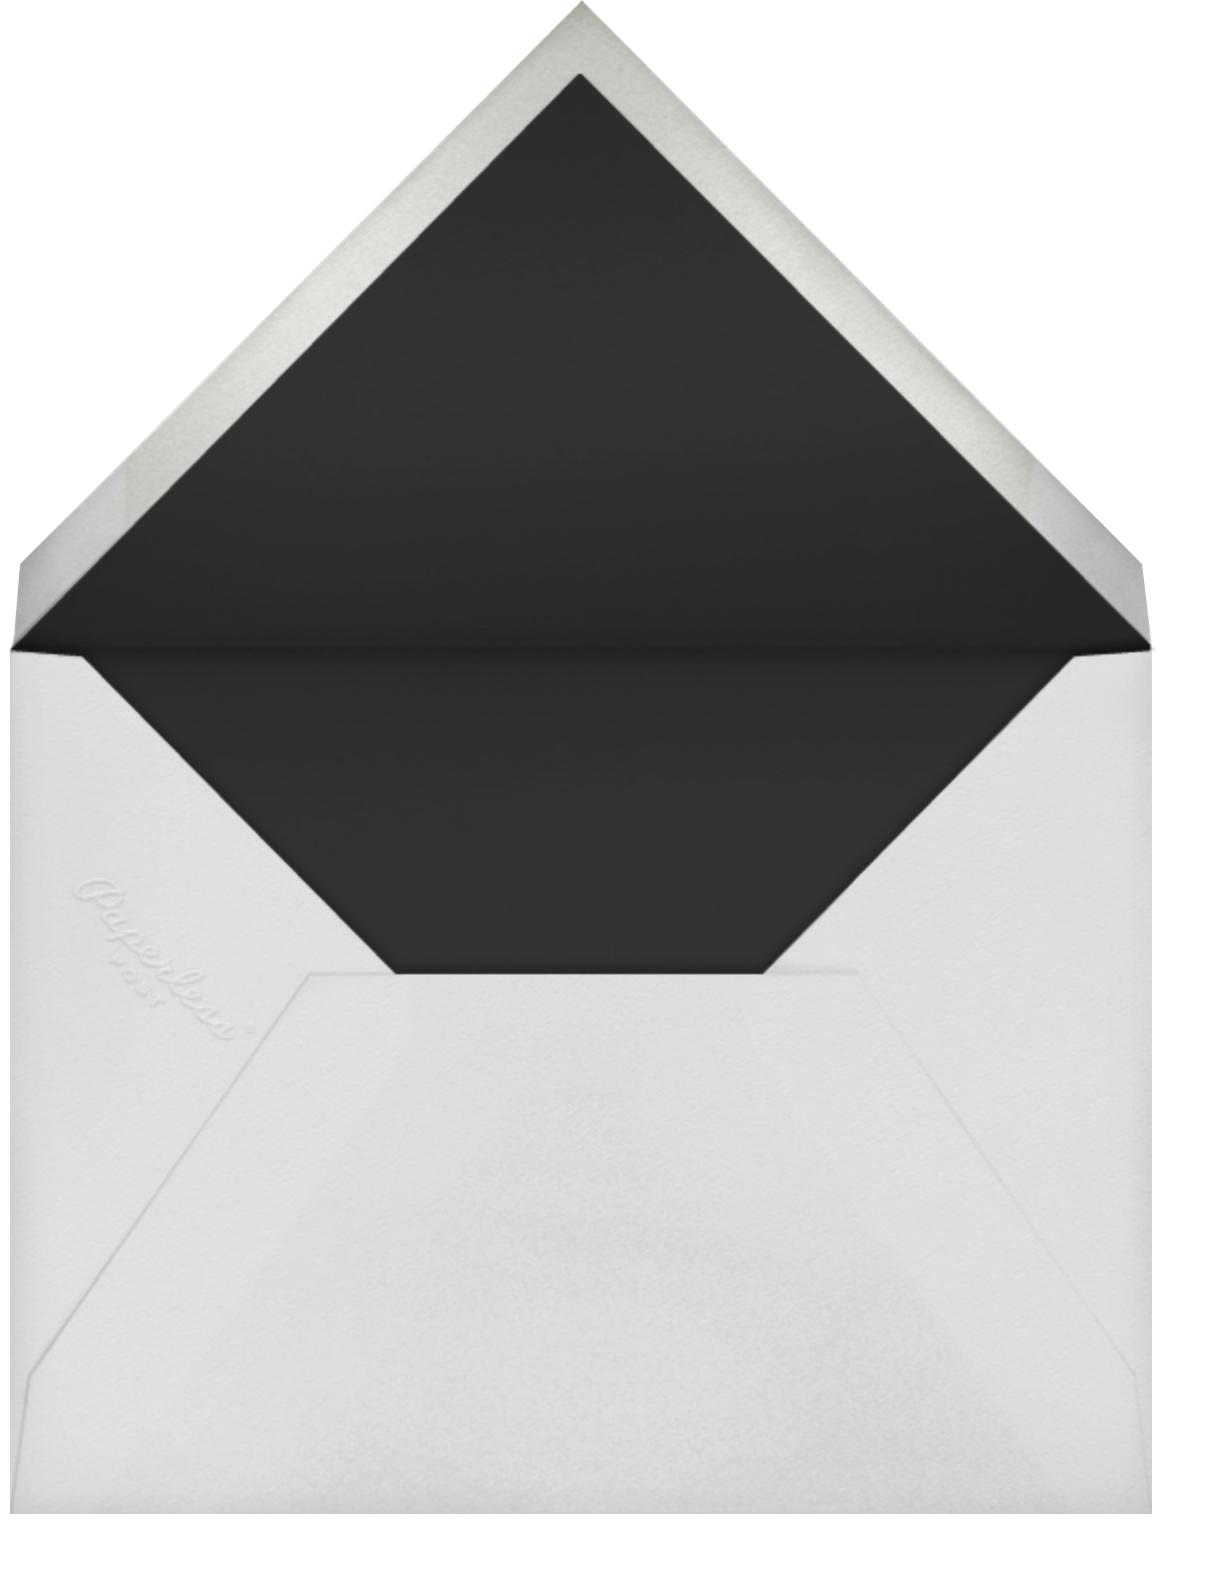 Floral Trellis II - White/Gold - Oscar de la Renta - All - envelope back